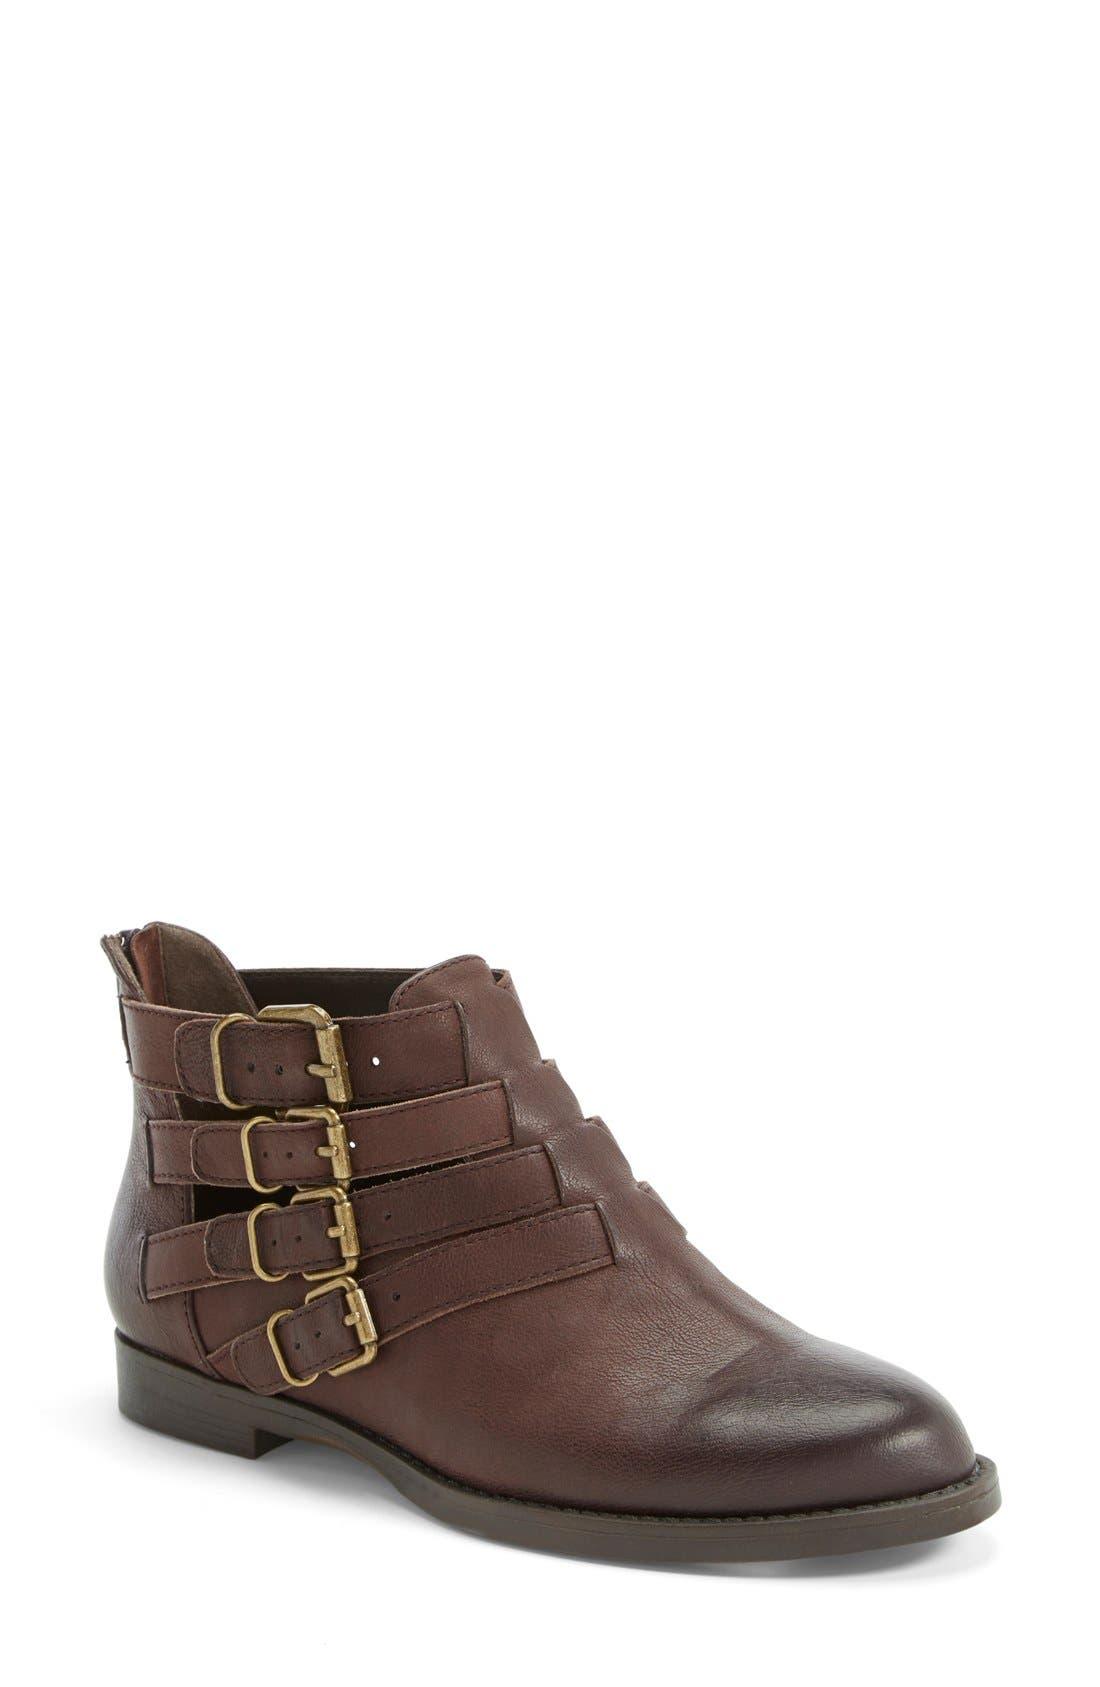 Bella Vita 'Ronan' Buckle Leather Bootie (Women) (Online Only)